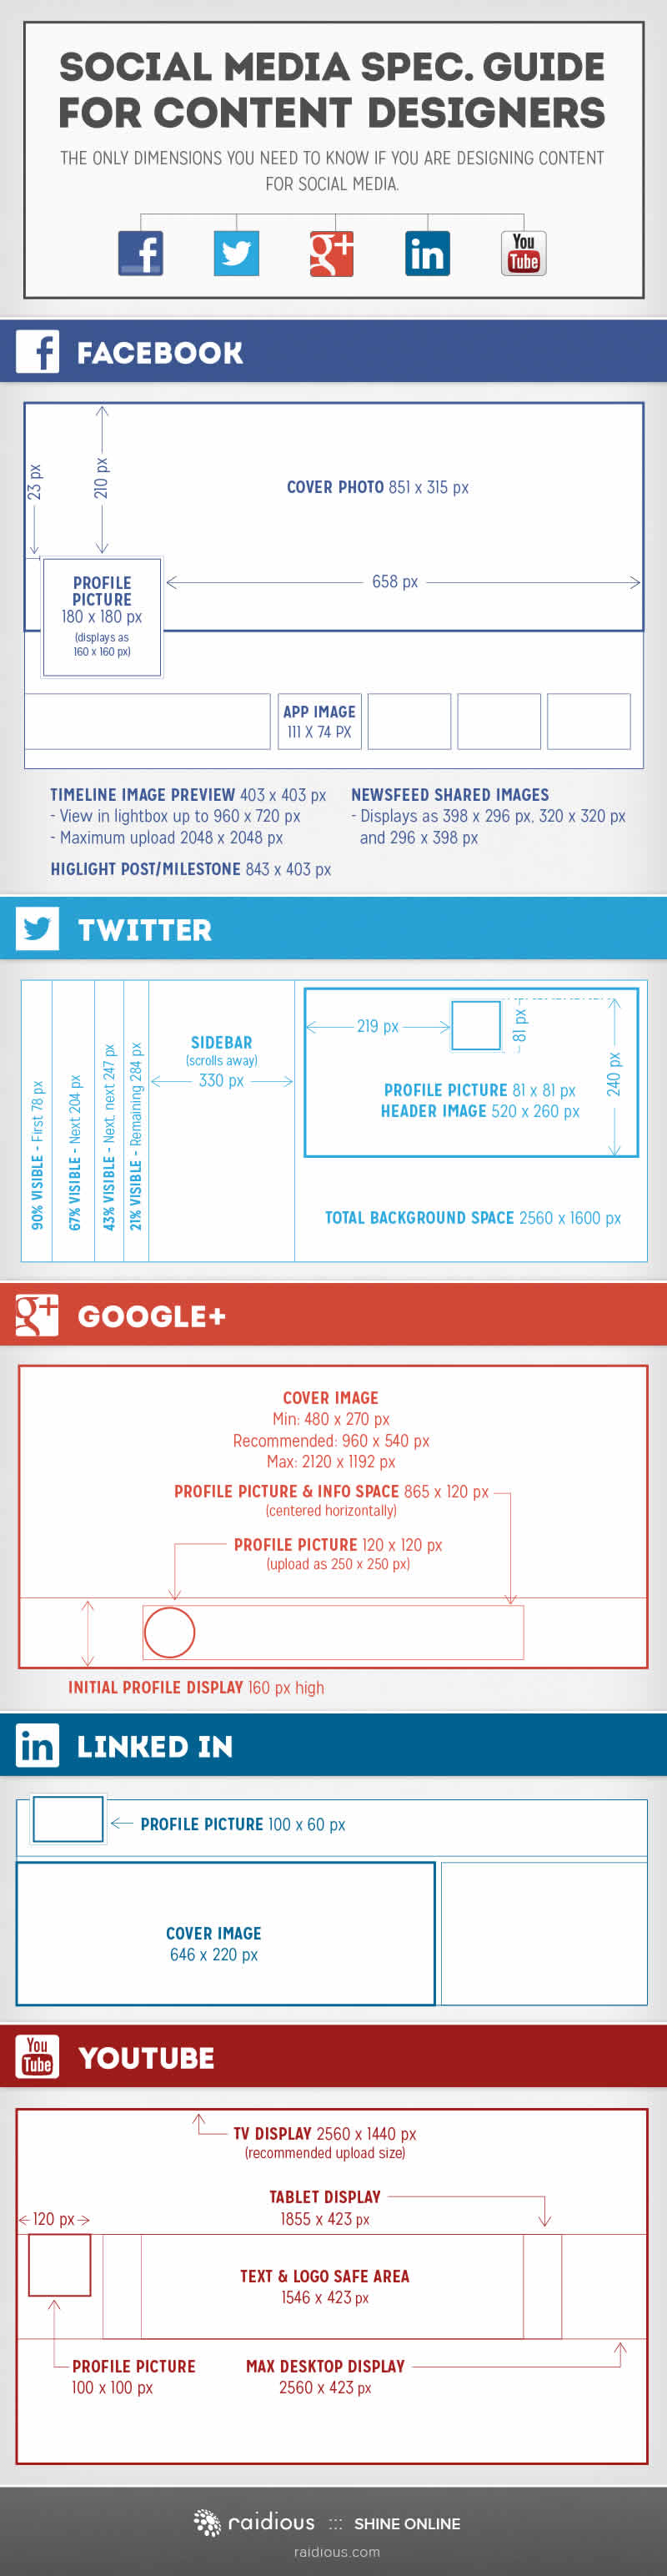 profile_pic_infographic